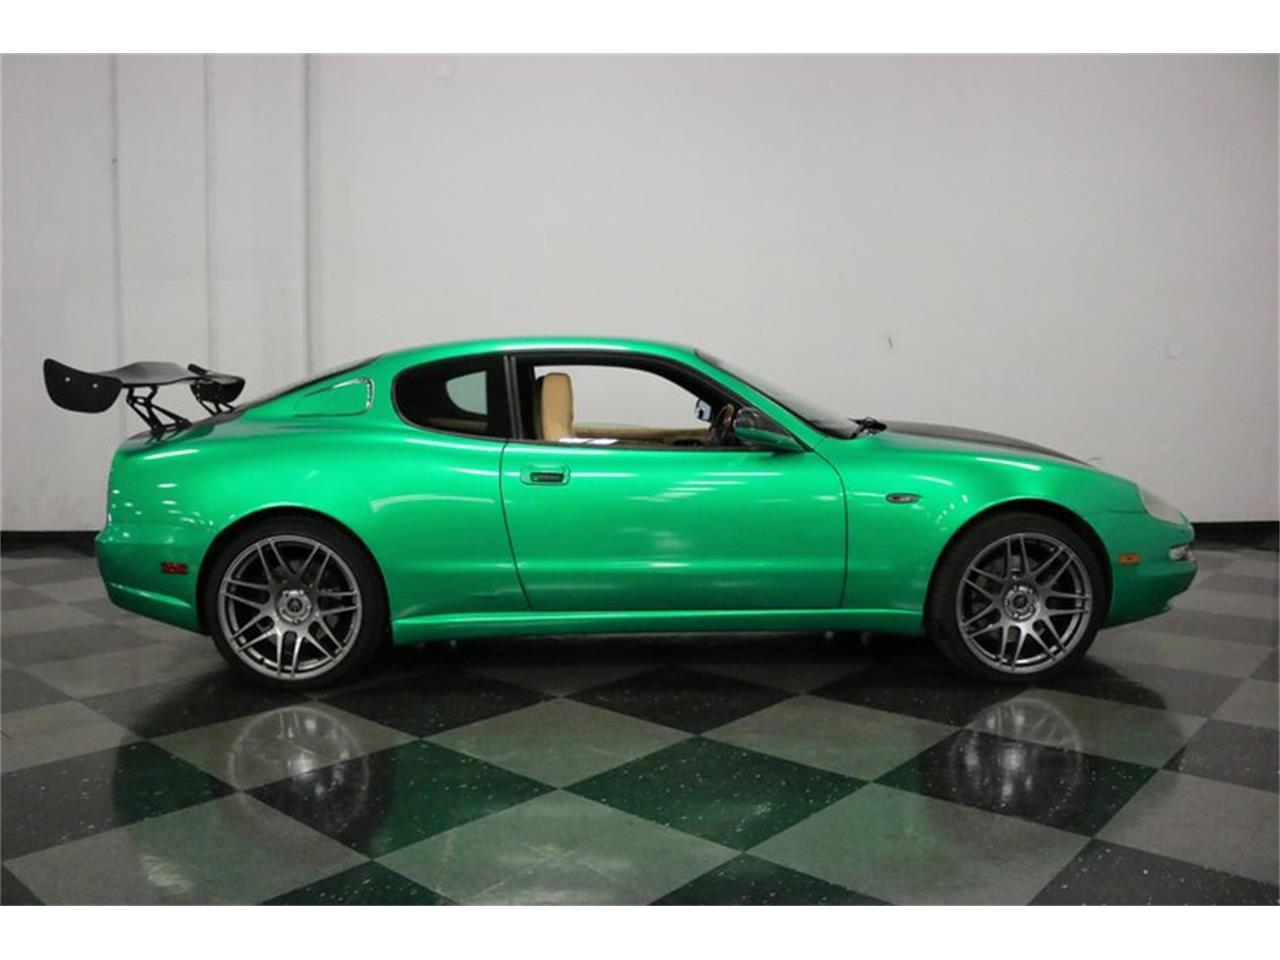 2004 Maserati Coupe for Sale | ClassicCars.com | CC-1191264